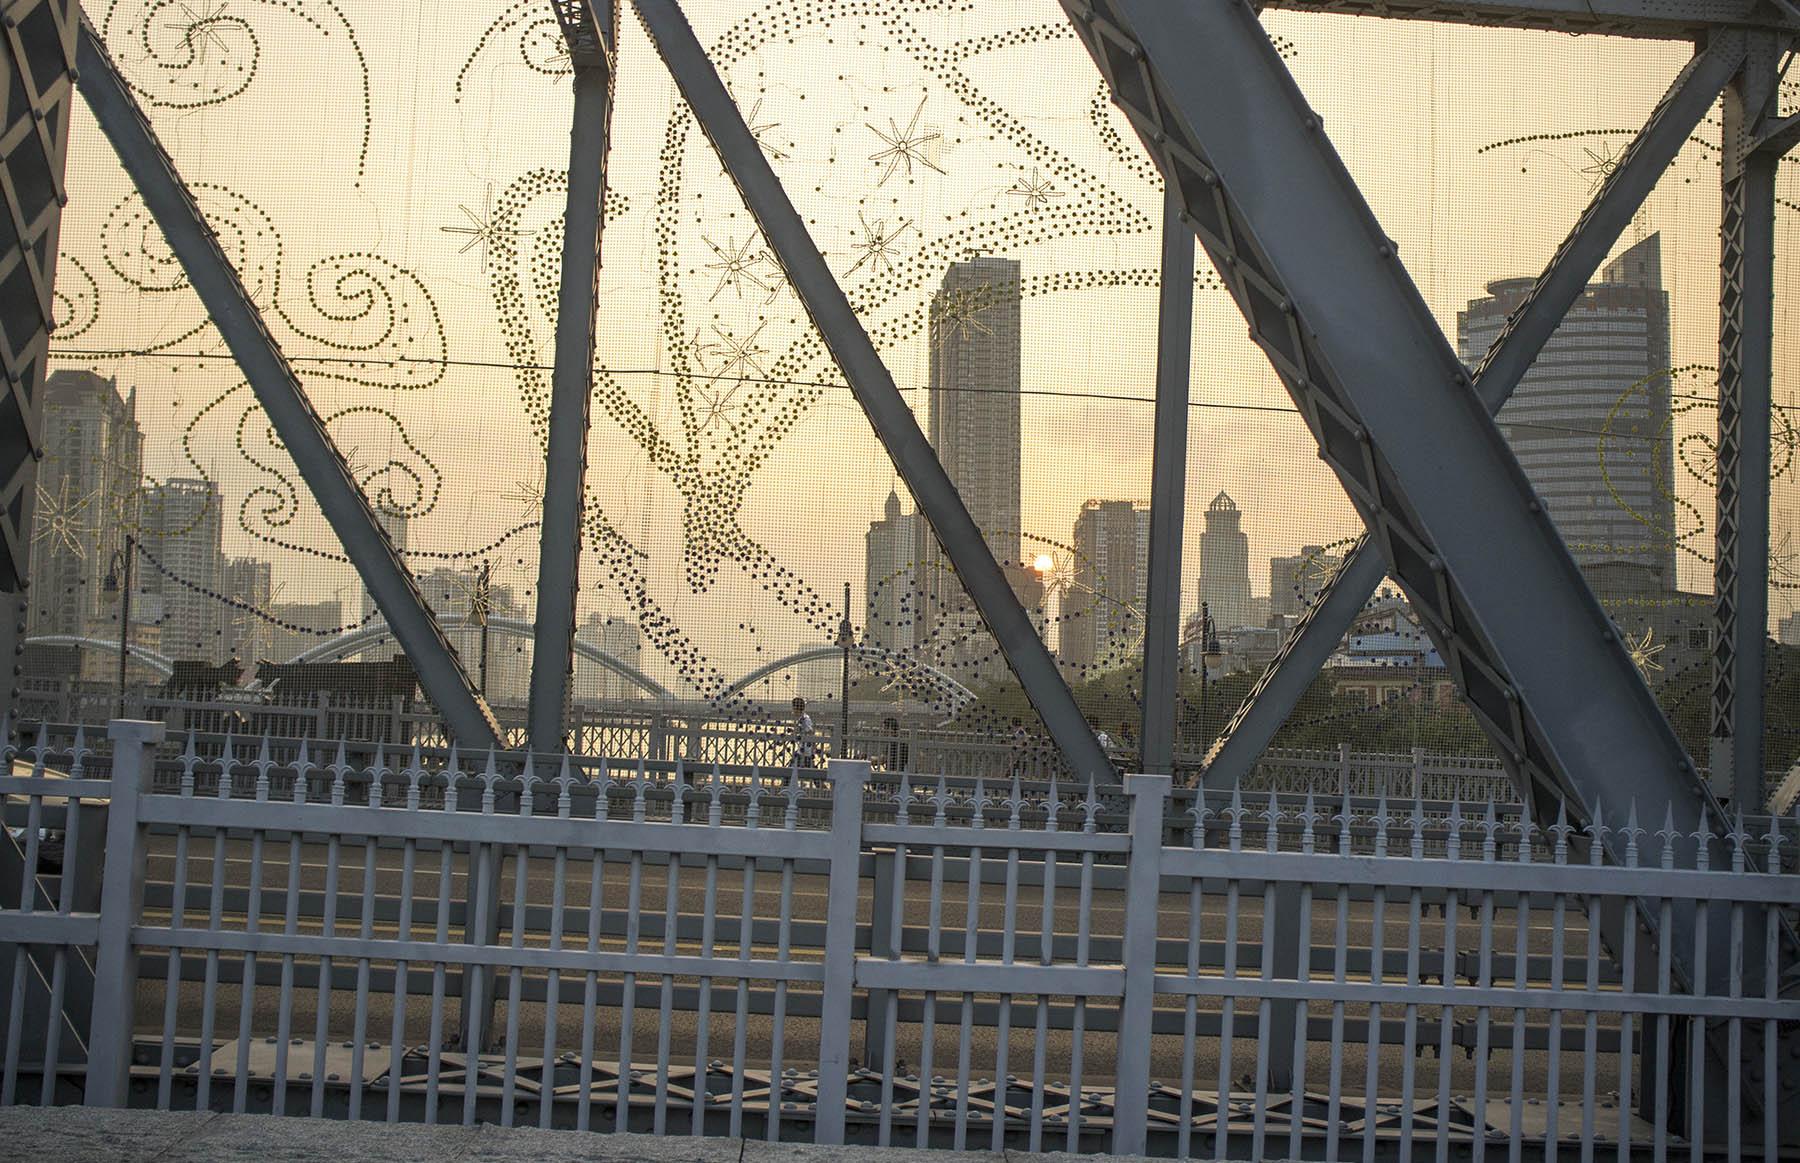 Evening on the bridge.